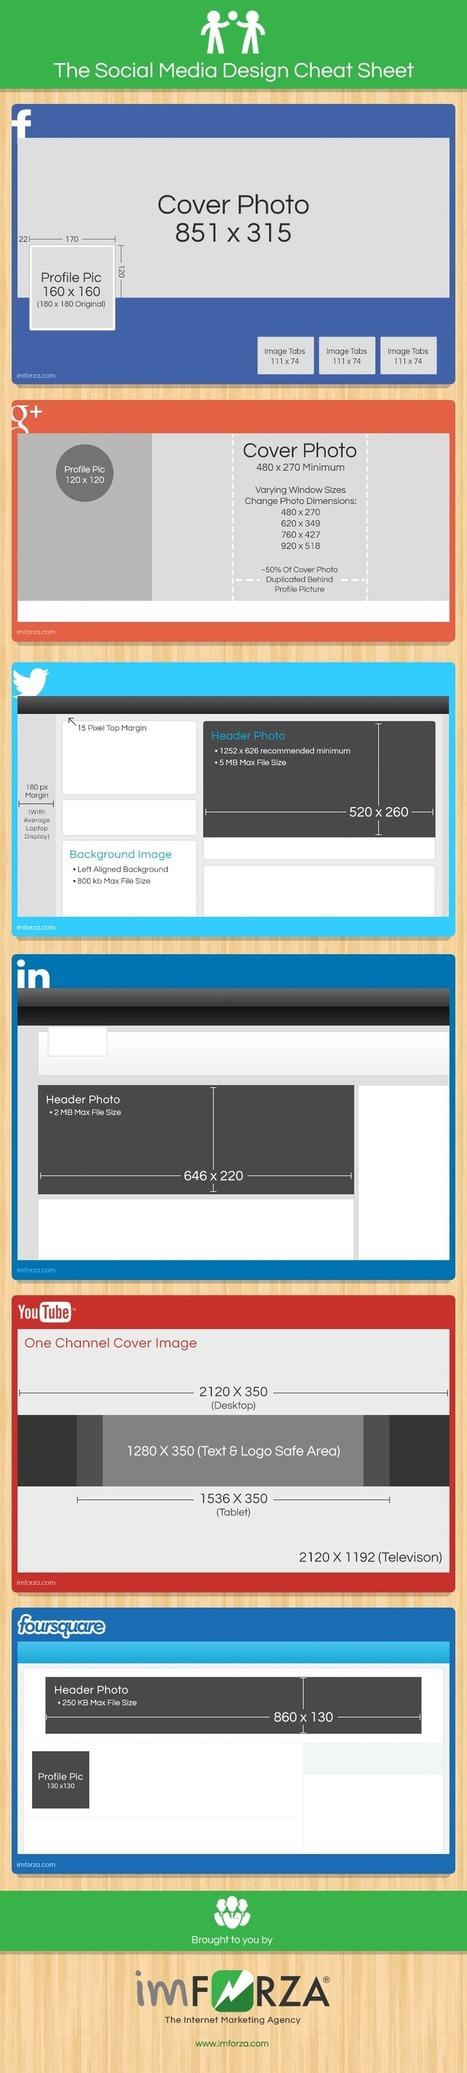 Social Media Design Cheat Sheet | Infographic | imFORZA Blog | Web Marketing Tips, Hints & Tricks | Scoop.it